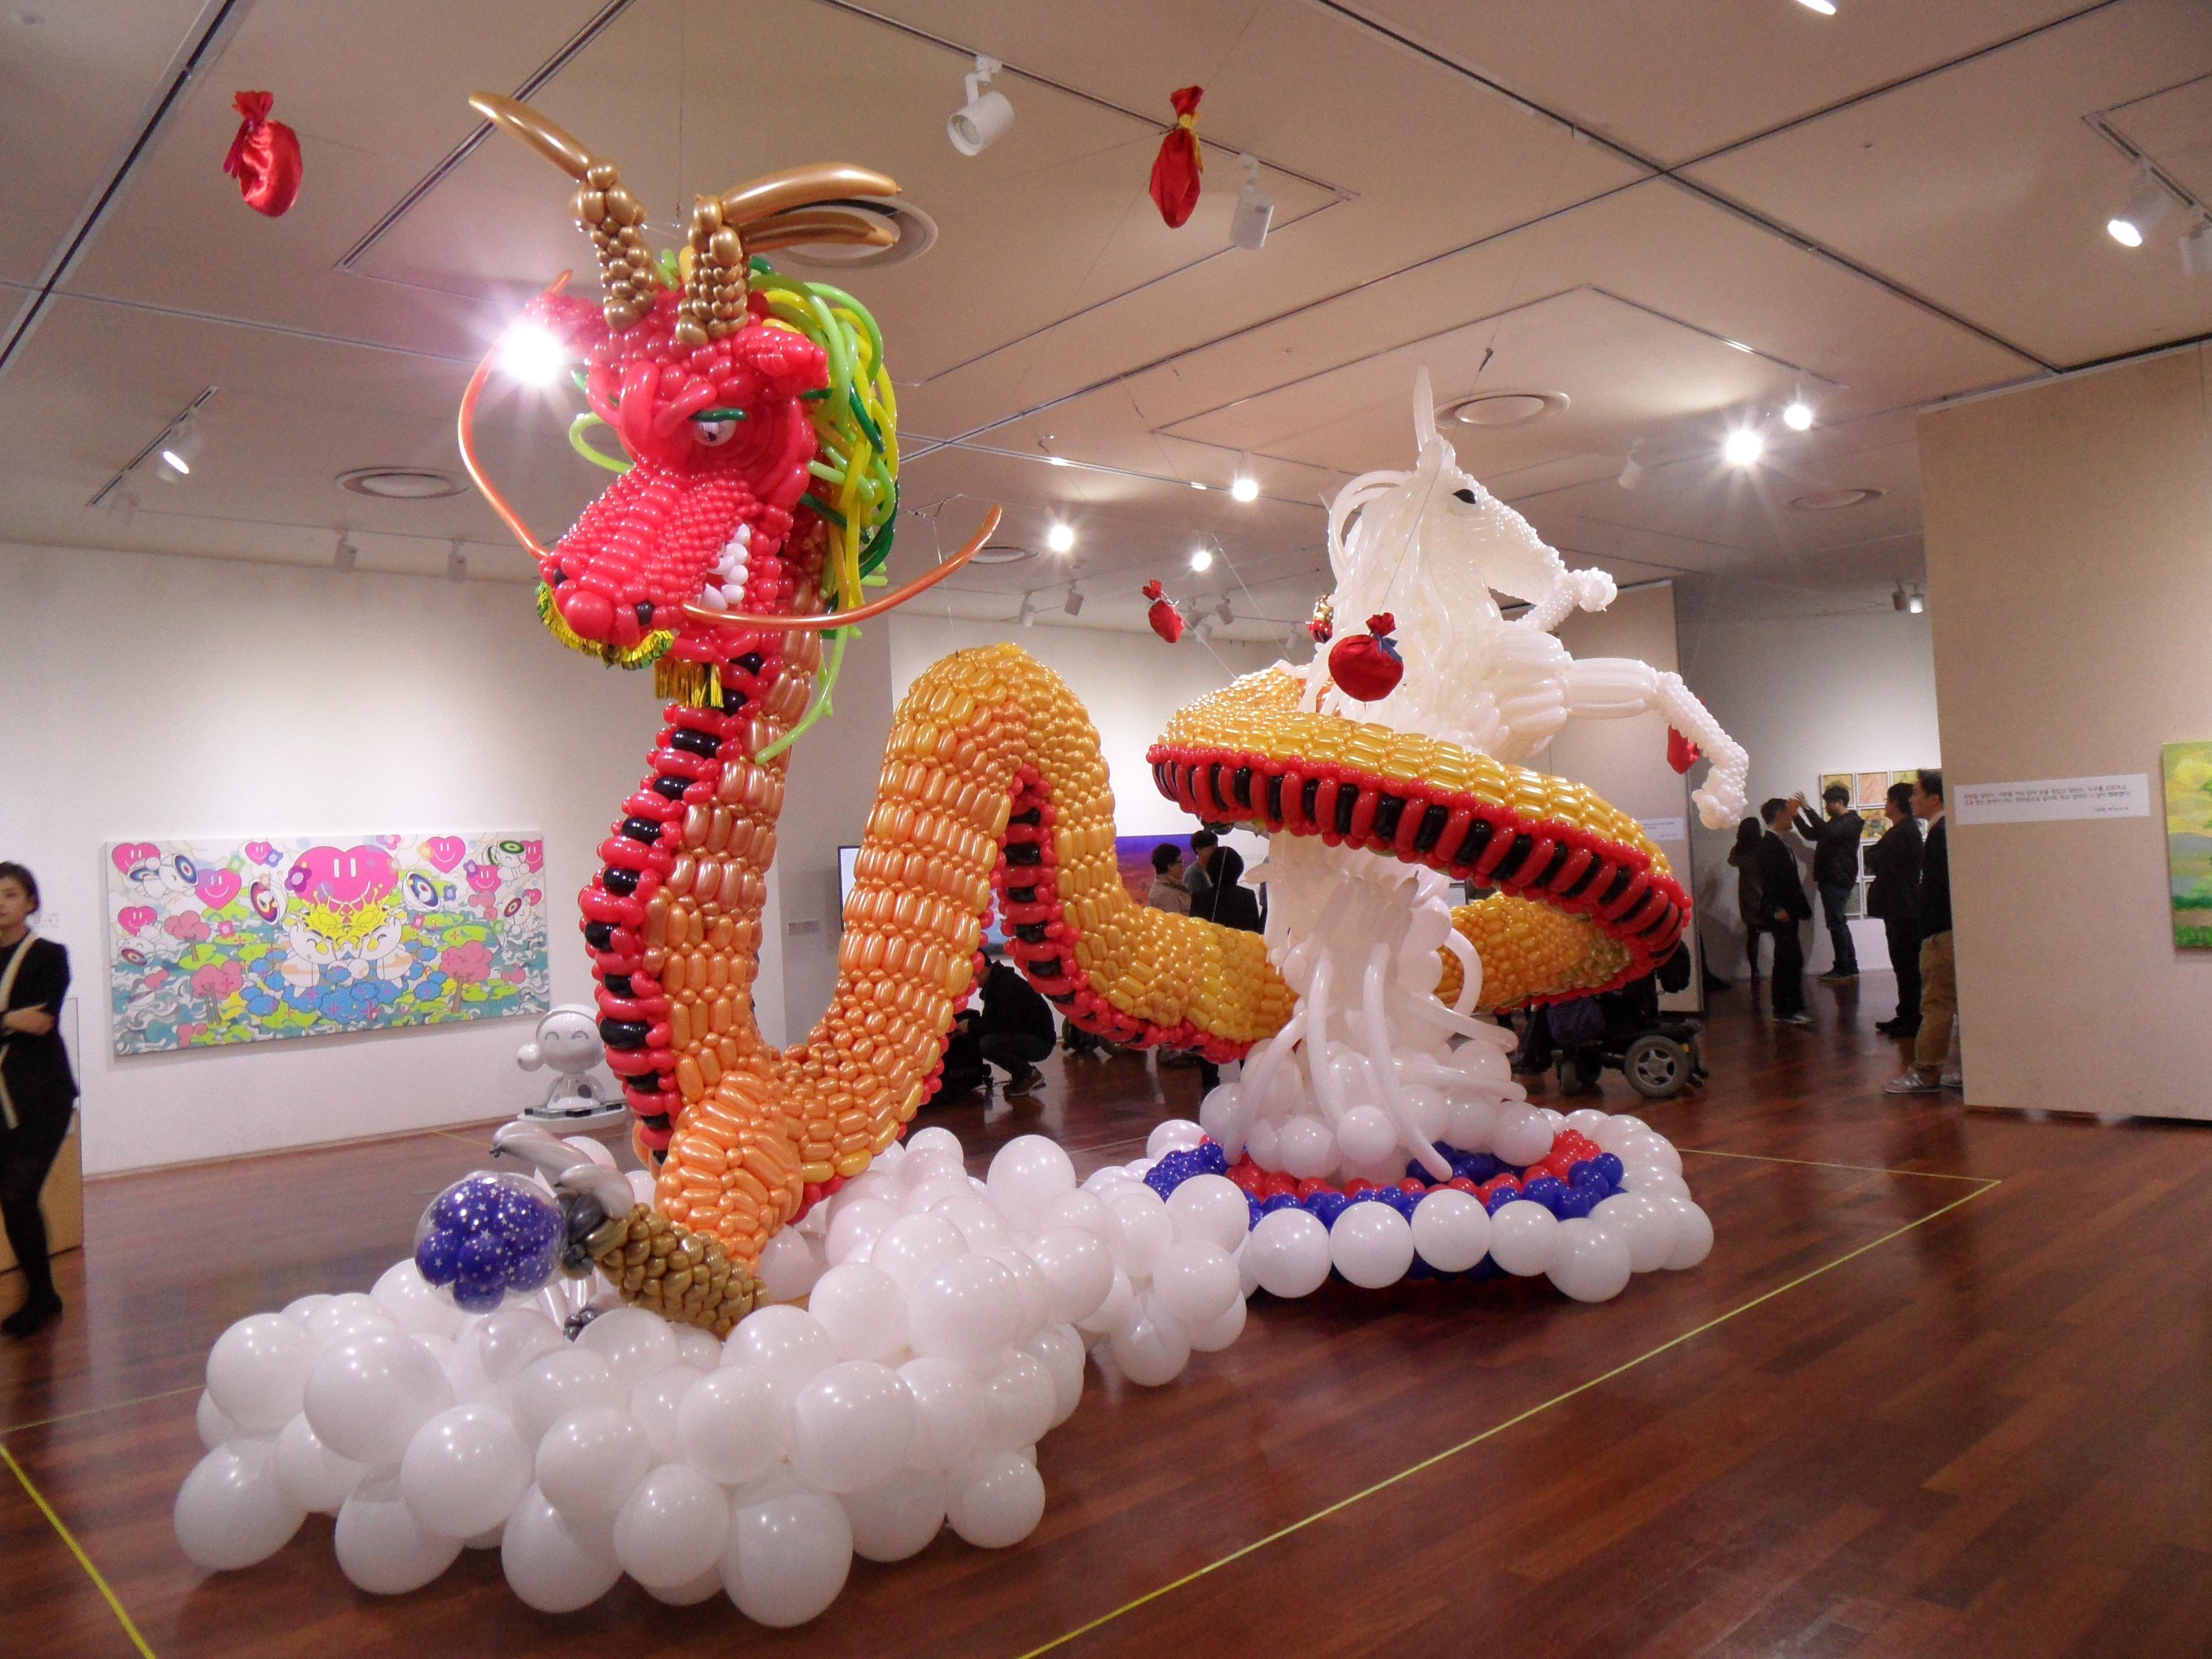 a balloon sculpture of a dragon and unicorn